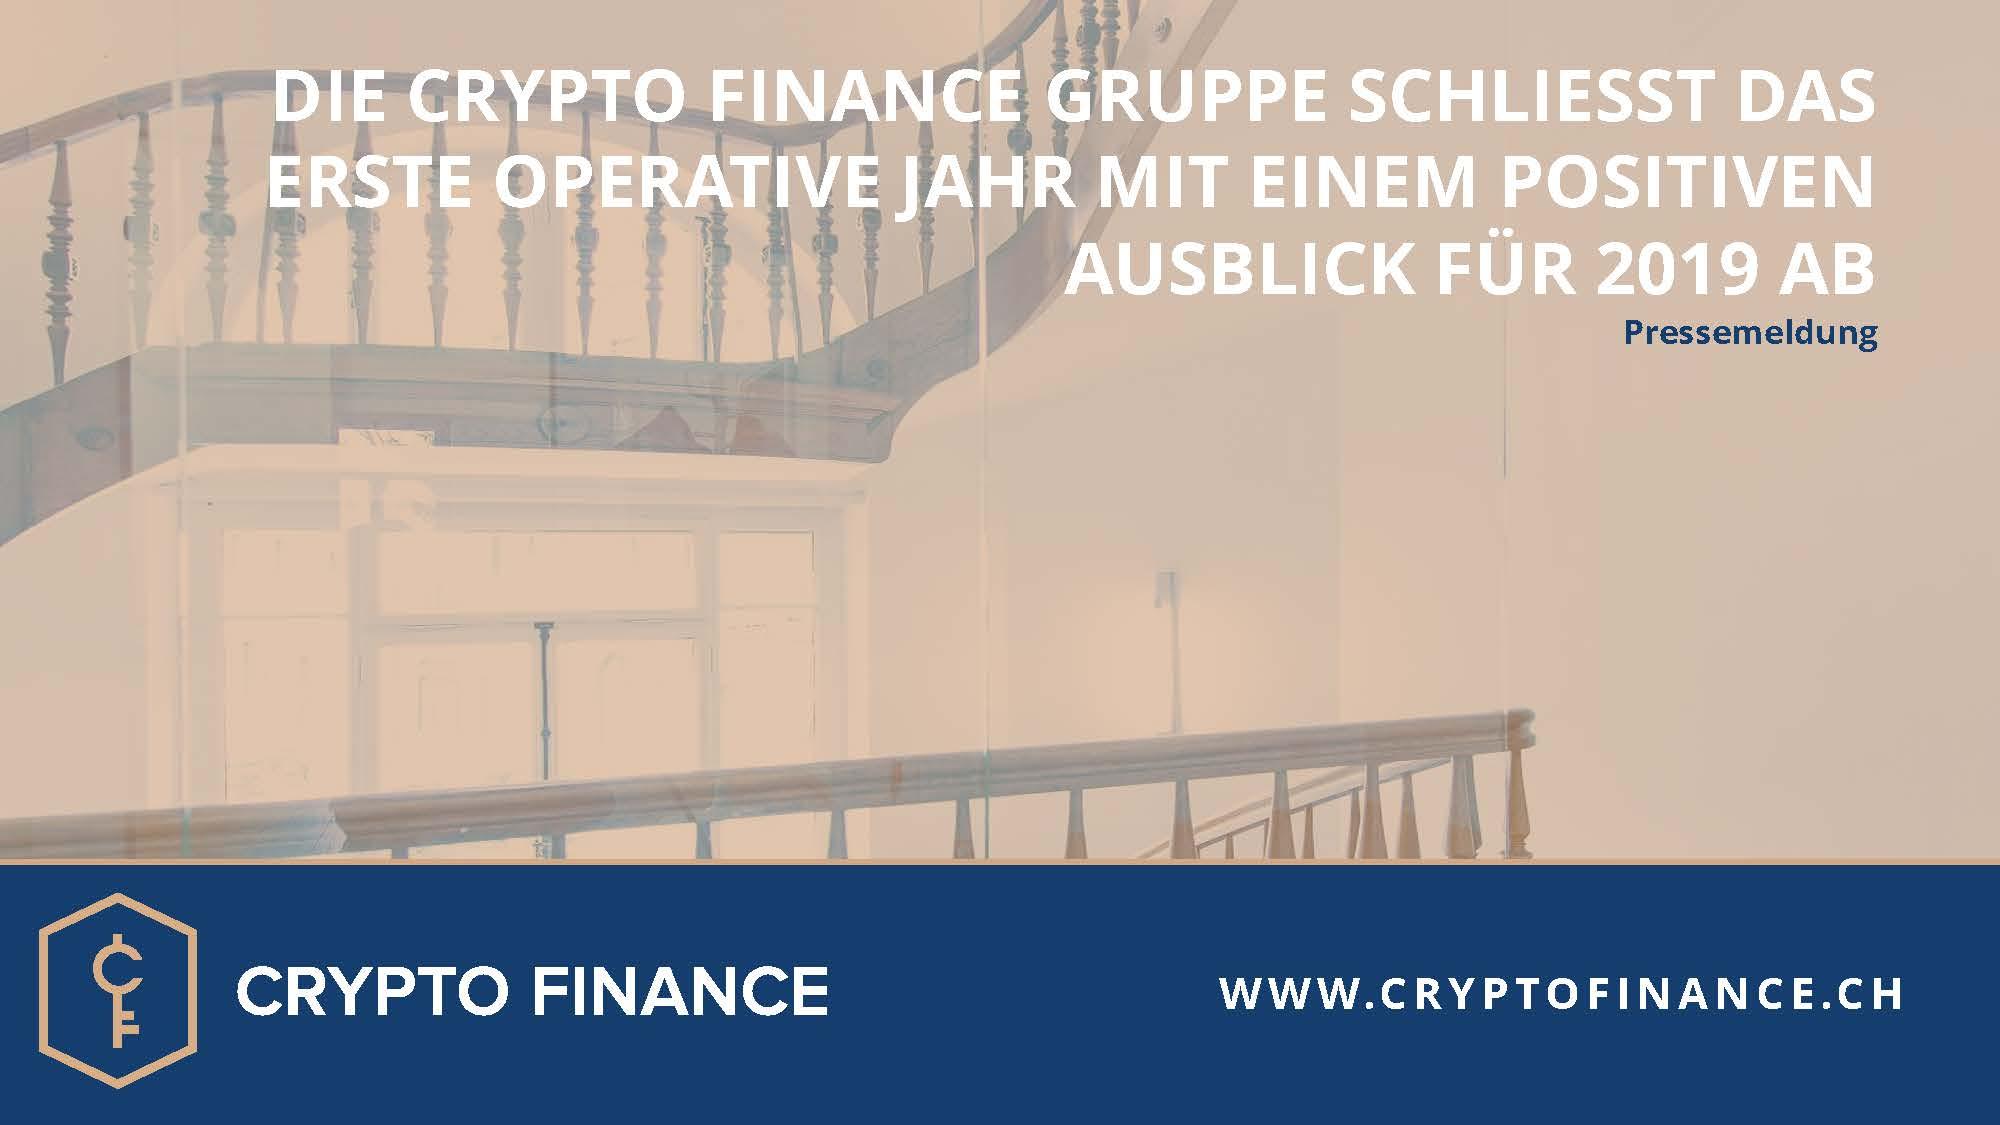 Crypto Finance Gruppe